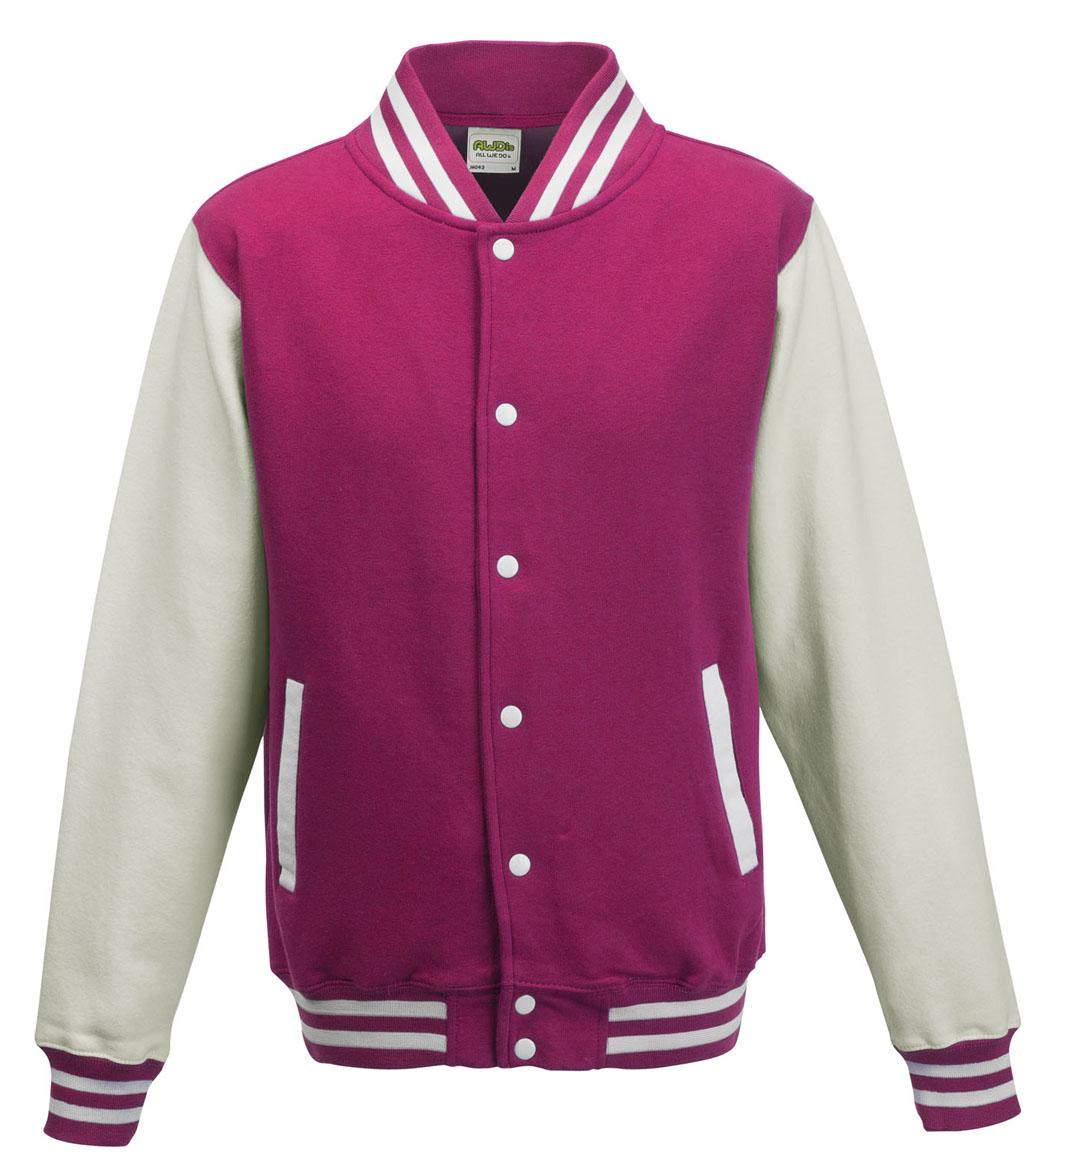 JH043 Hot Pink - White